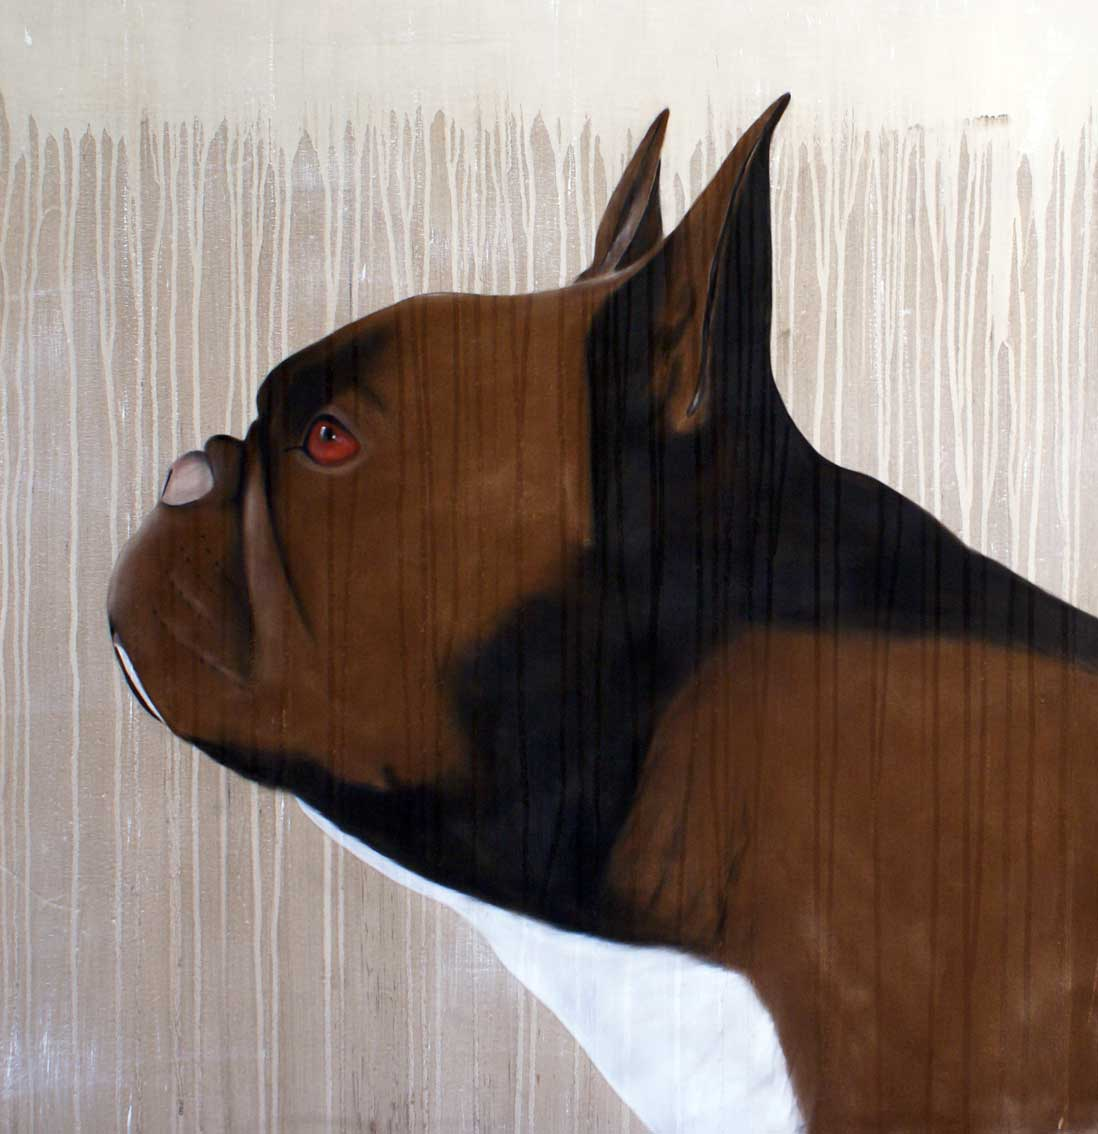 bouledogue francais 01 bouledogue fran ais chien bouledogue animal familier thierry bisch. Black Bedroom Furniture Sets. Home Design Ideas